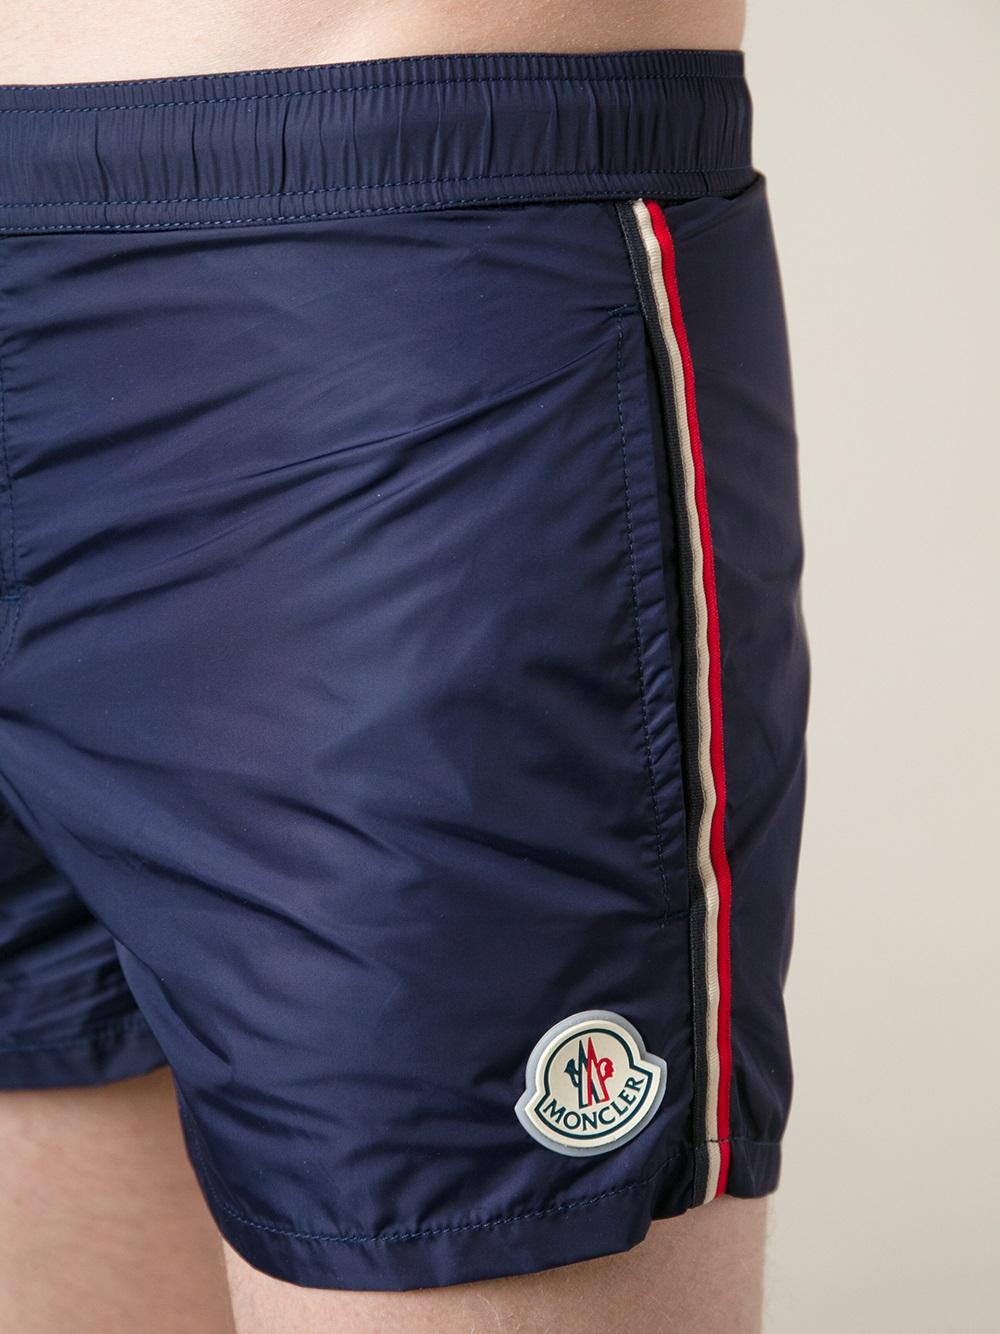 moncler shorts